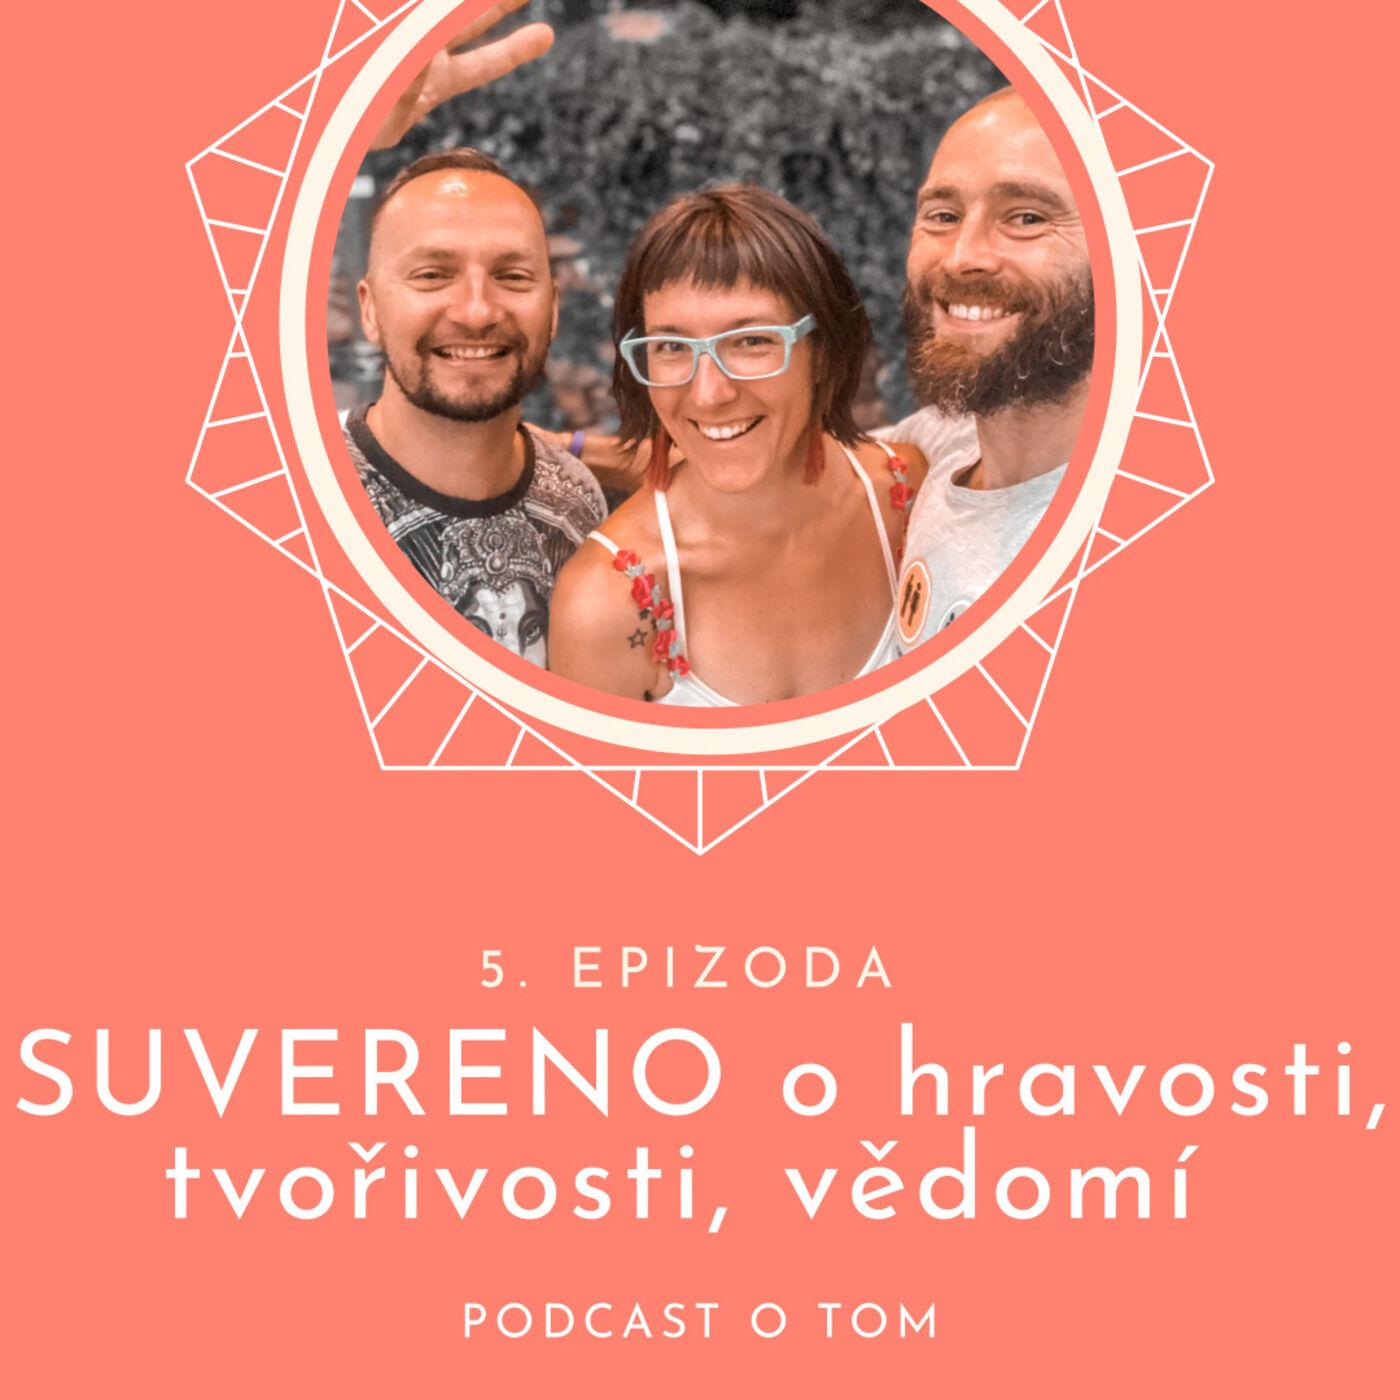 5. epizoda - O tvořivosti, hravosti, vědomí / rozhovor Suvereno